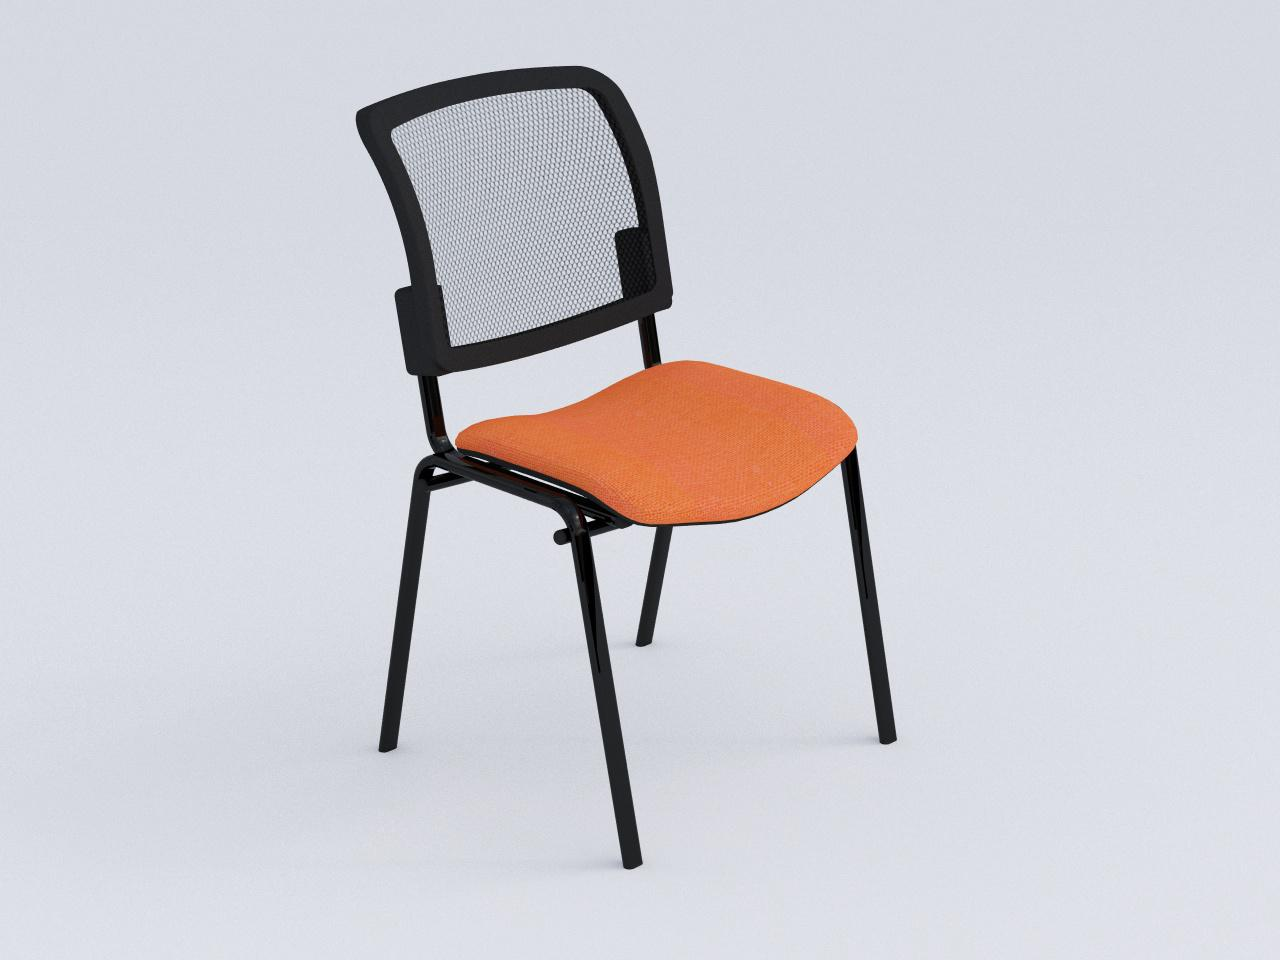 silla de visita tubo plano iso mesh